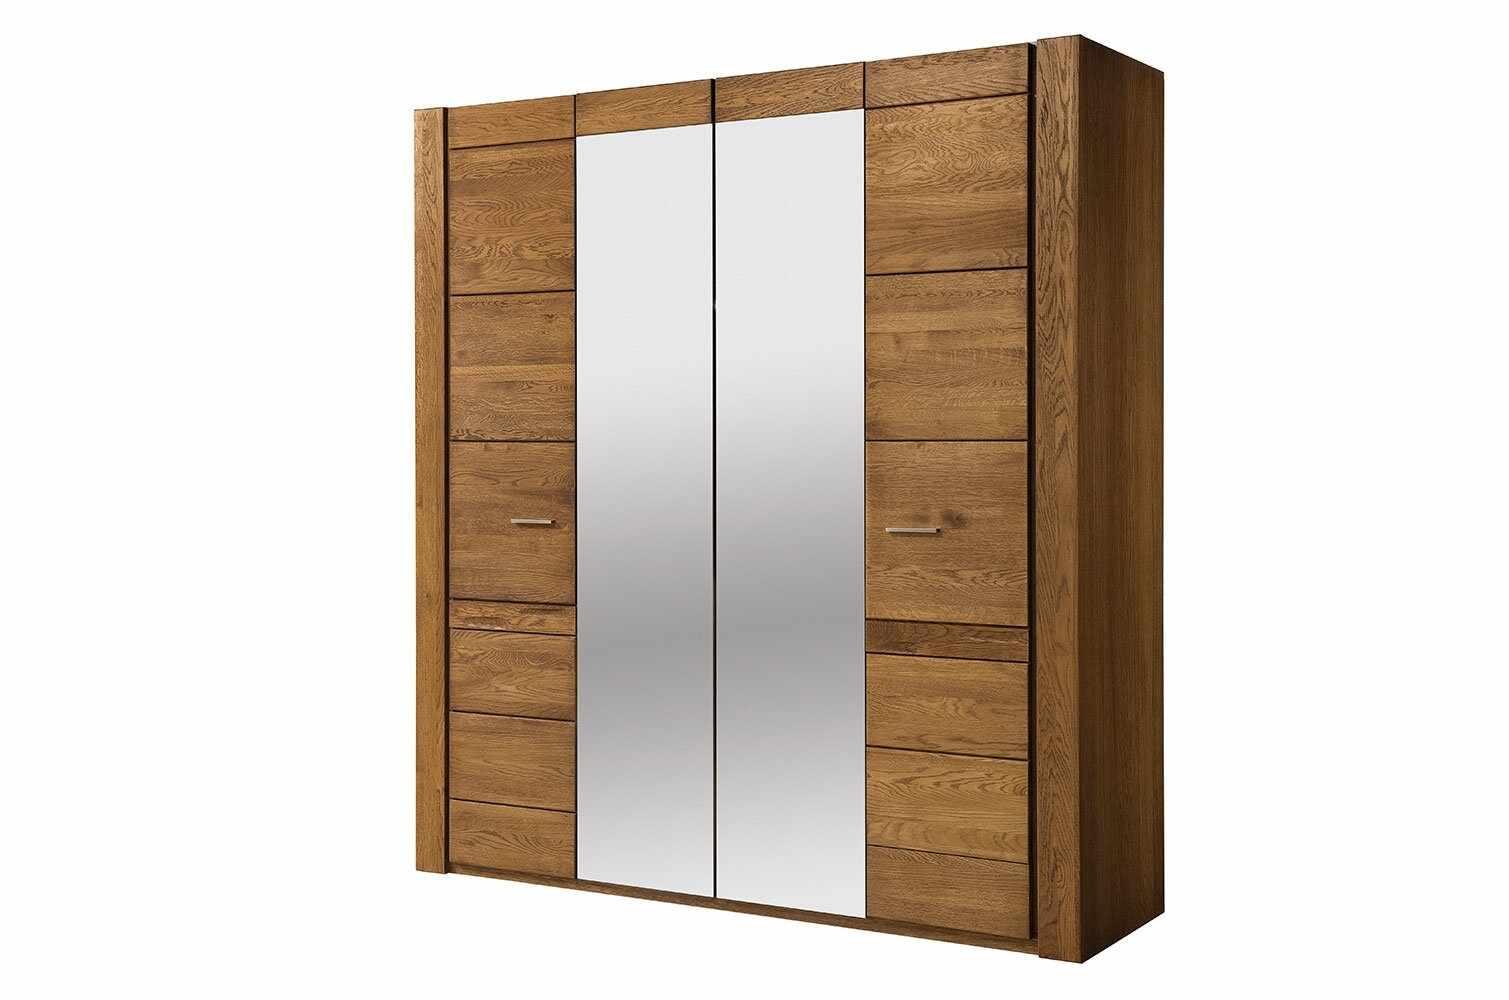 Dulap din furnir si pal, cu 4 usi si oglinda Velvet 77 Stejar Rustic, l205xA60xH225 cm la pret 8269 lei